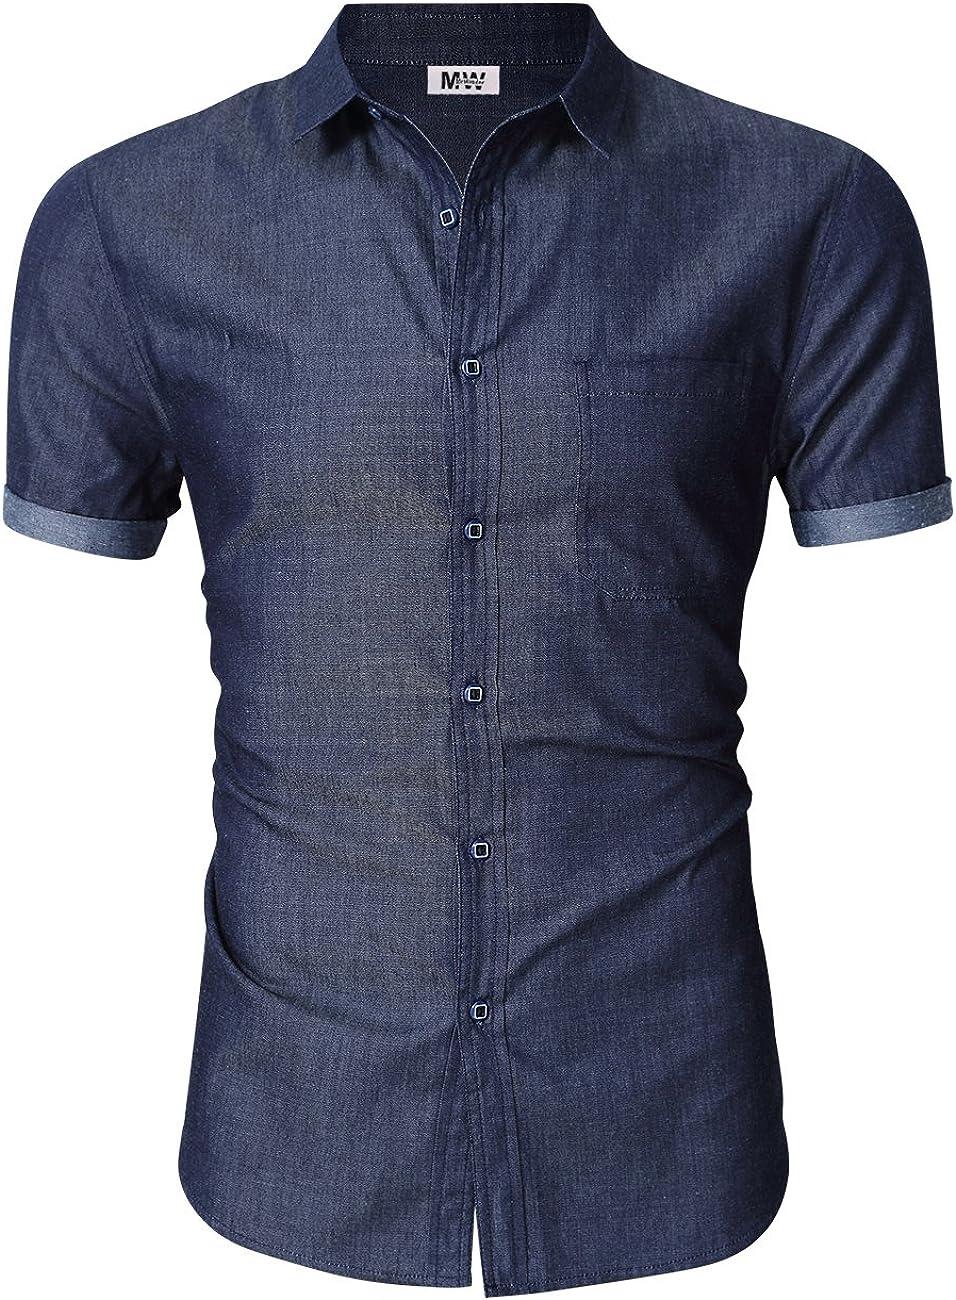 KUULEE Men's Button Down Jean Shirts Denim Work Shirt Slim Fit Dress Shirts Long/Short Sleeve Spring Shirt for Men